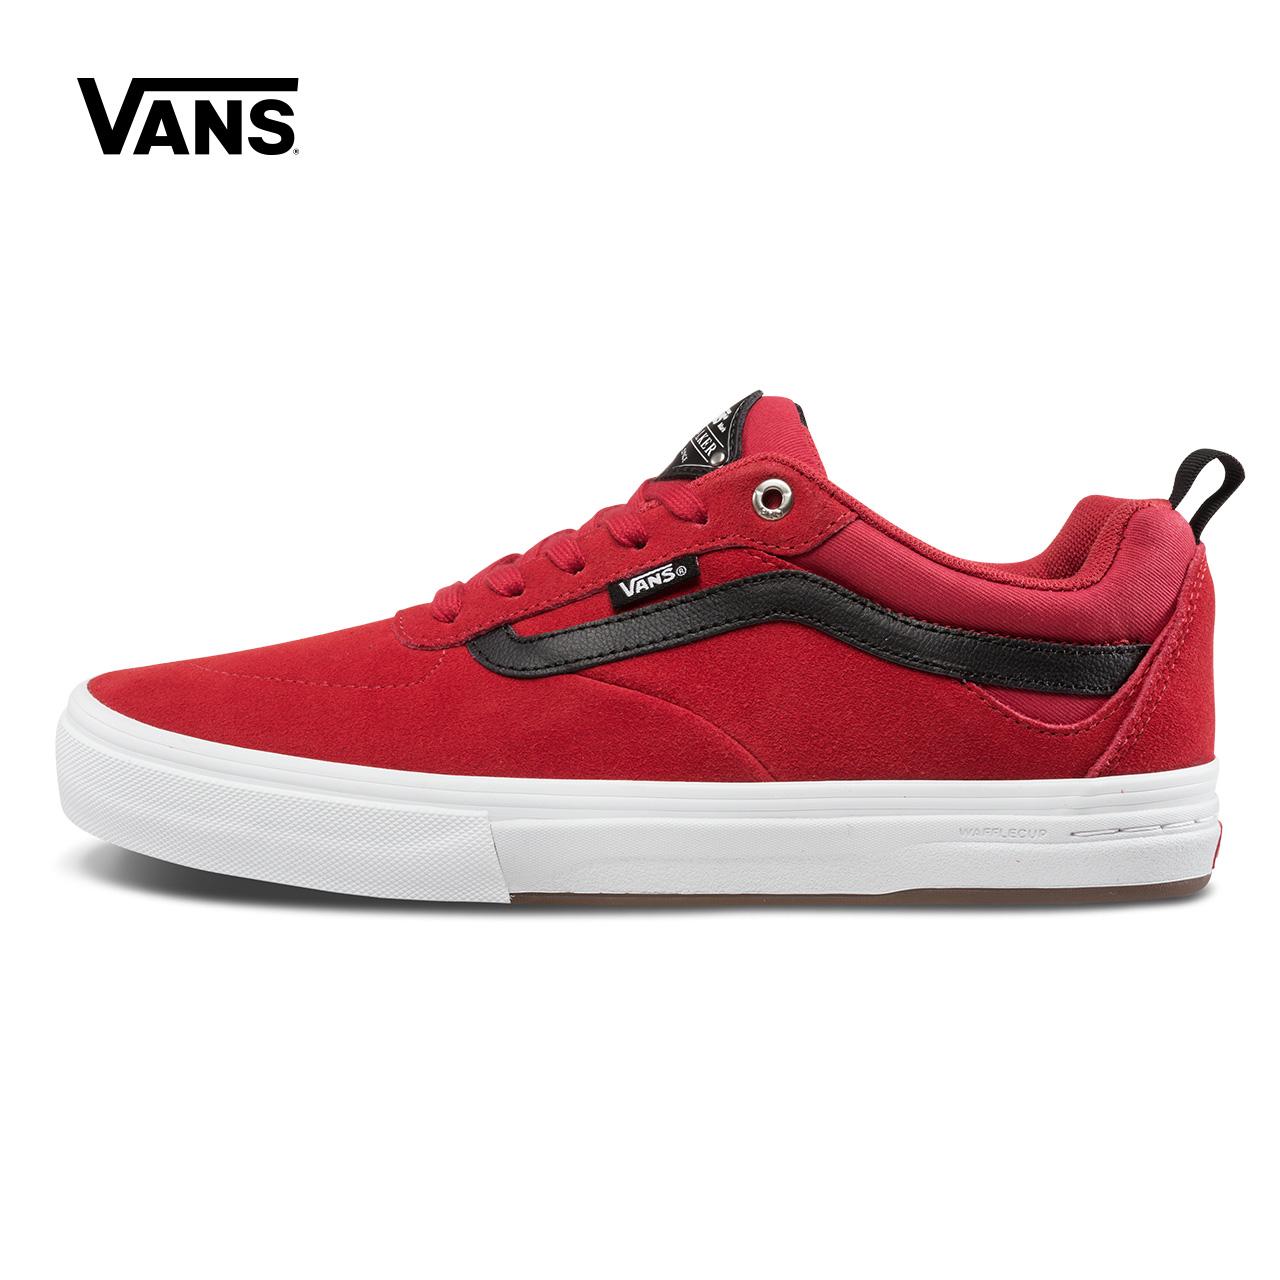 Vans 范斯官方男款侧边条纹滑板鞋|VN0A2XSGSJJ